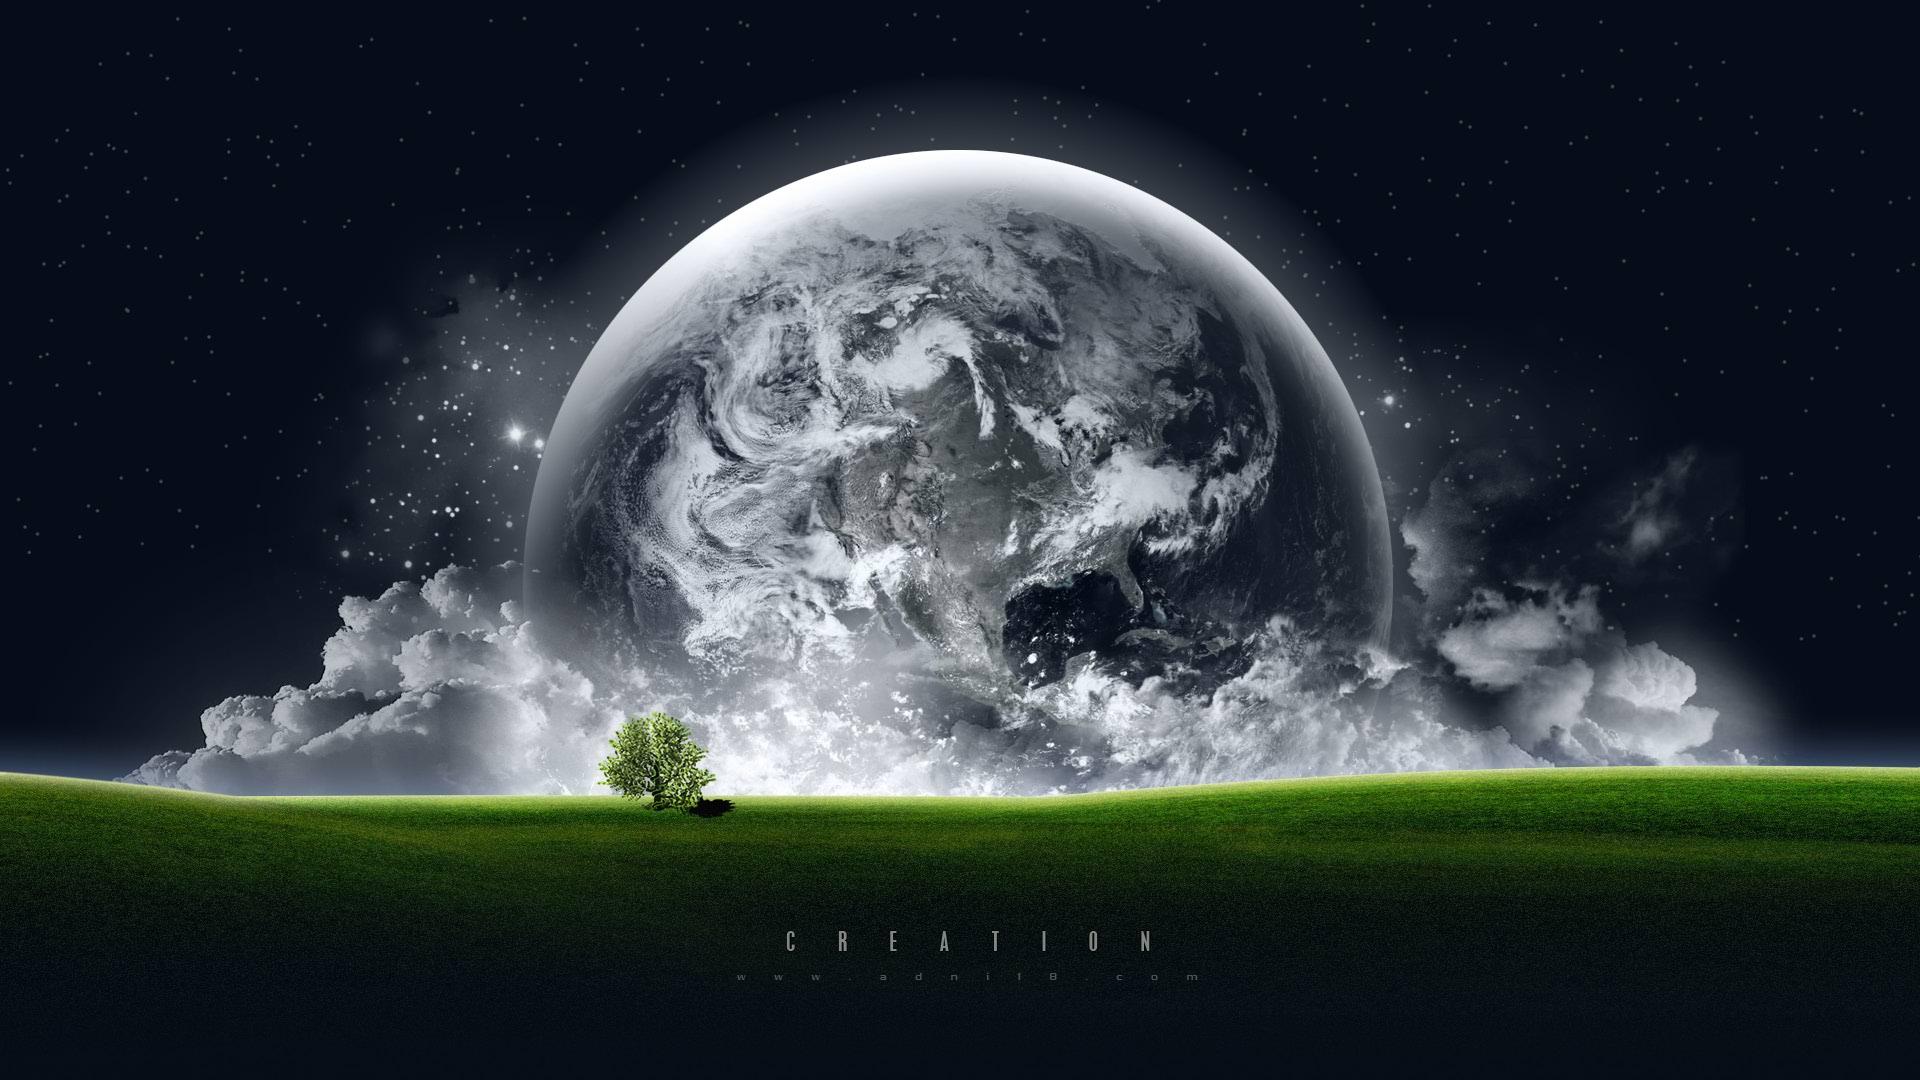 Creation4020014410 - Creation - Creation